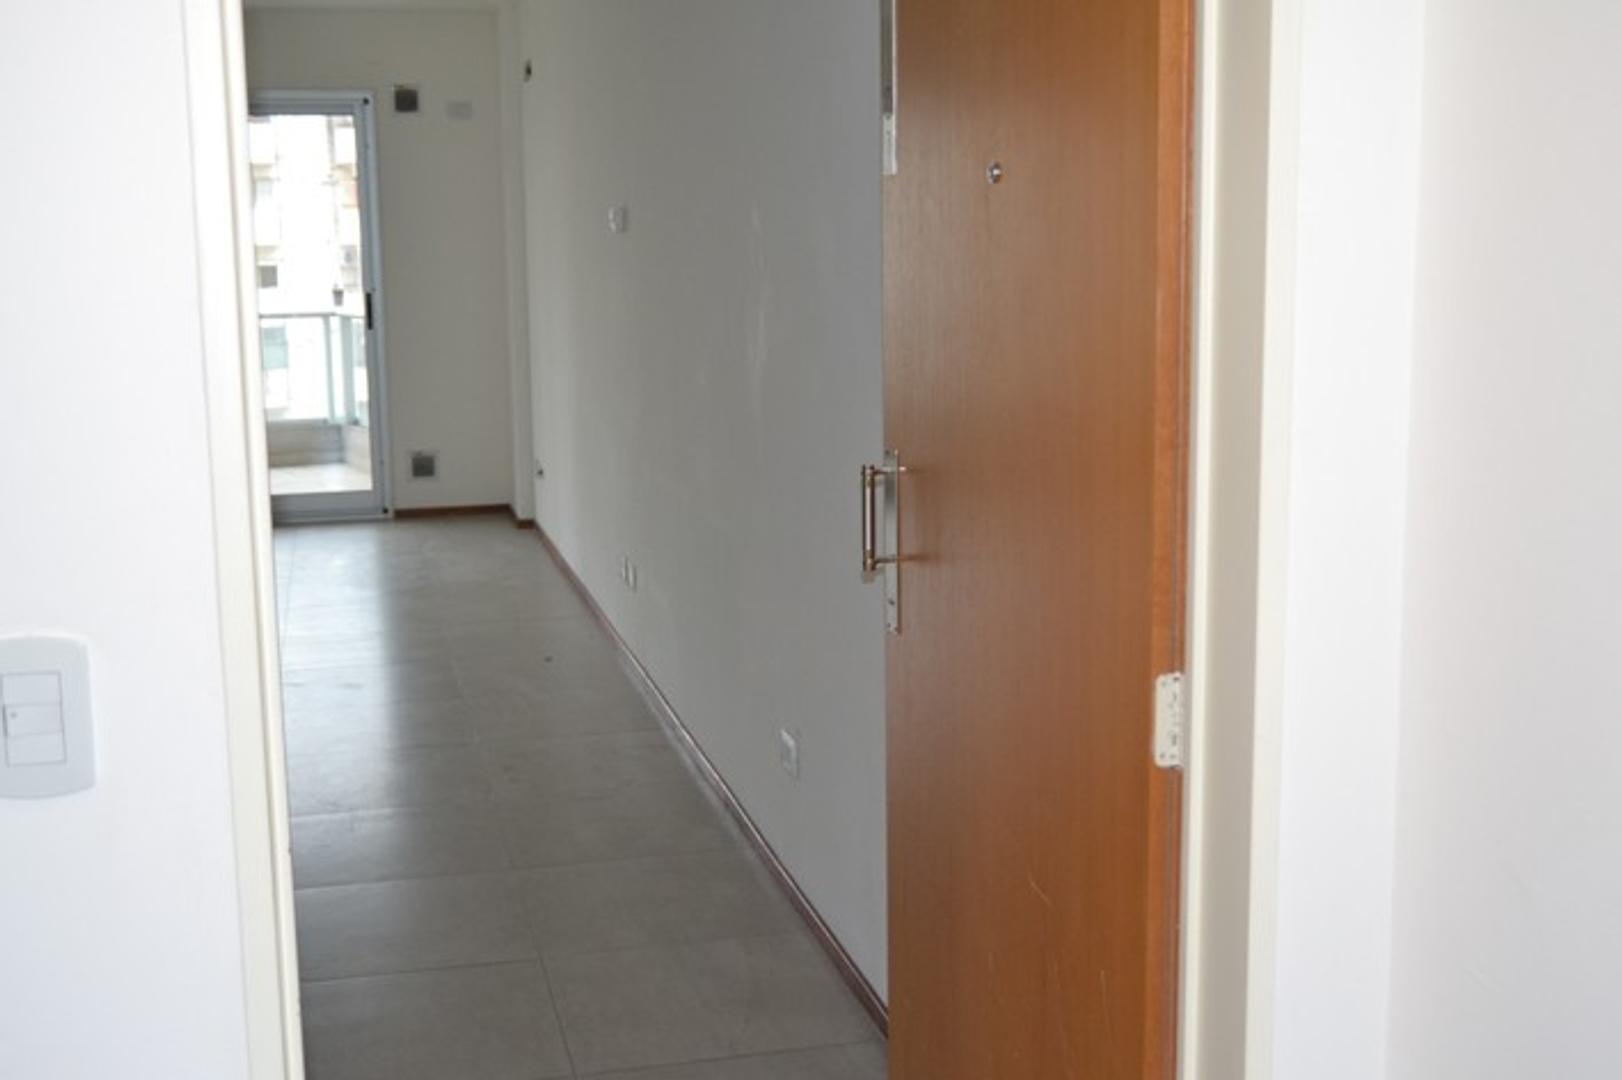 EXCEL DEPTO 1 AMB 50 m2, FRENTE BALCON CORRIDO